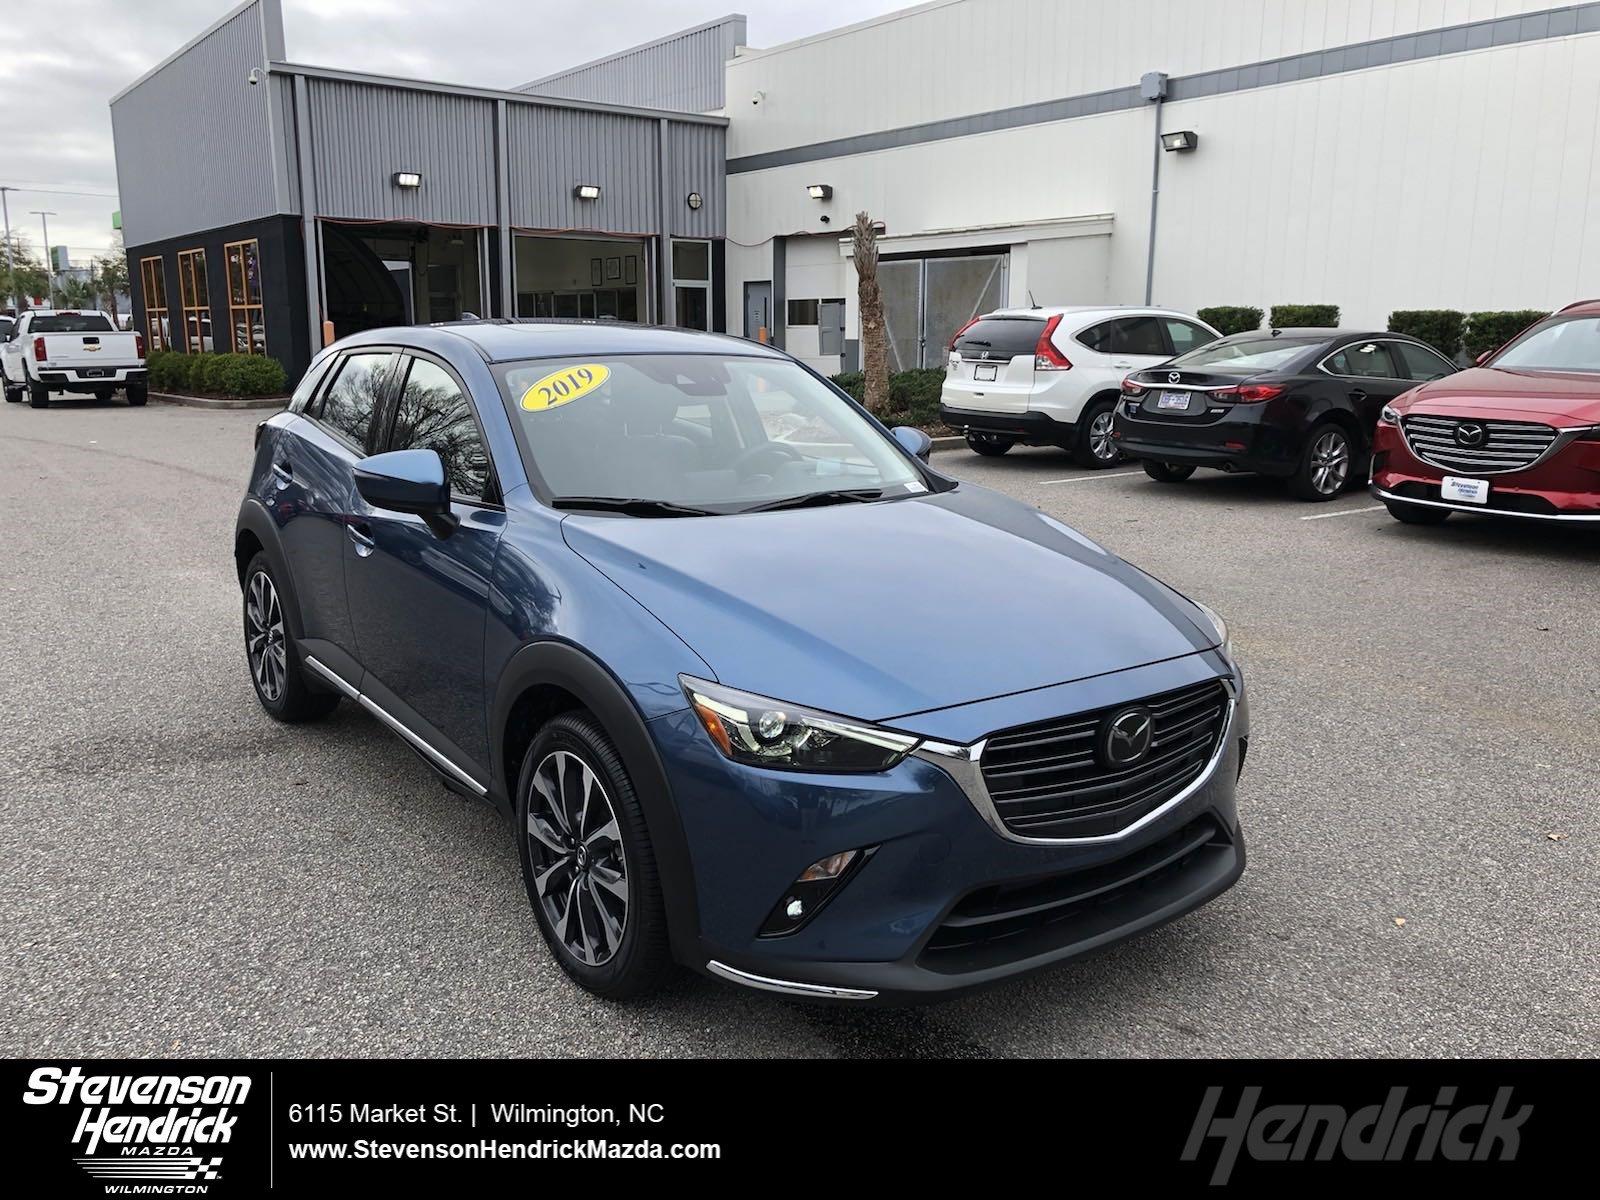 Pre-Owned 2019 Mazda CX-3 Grand Touring